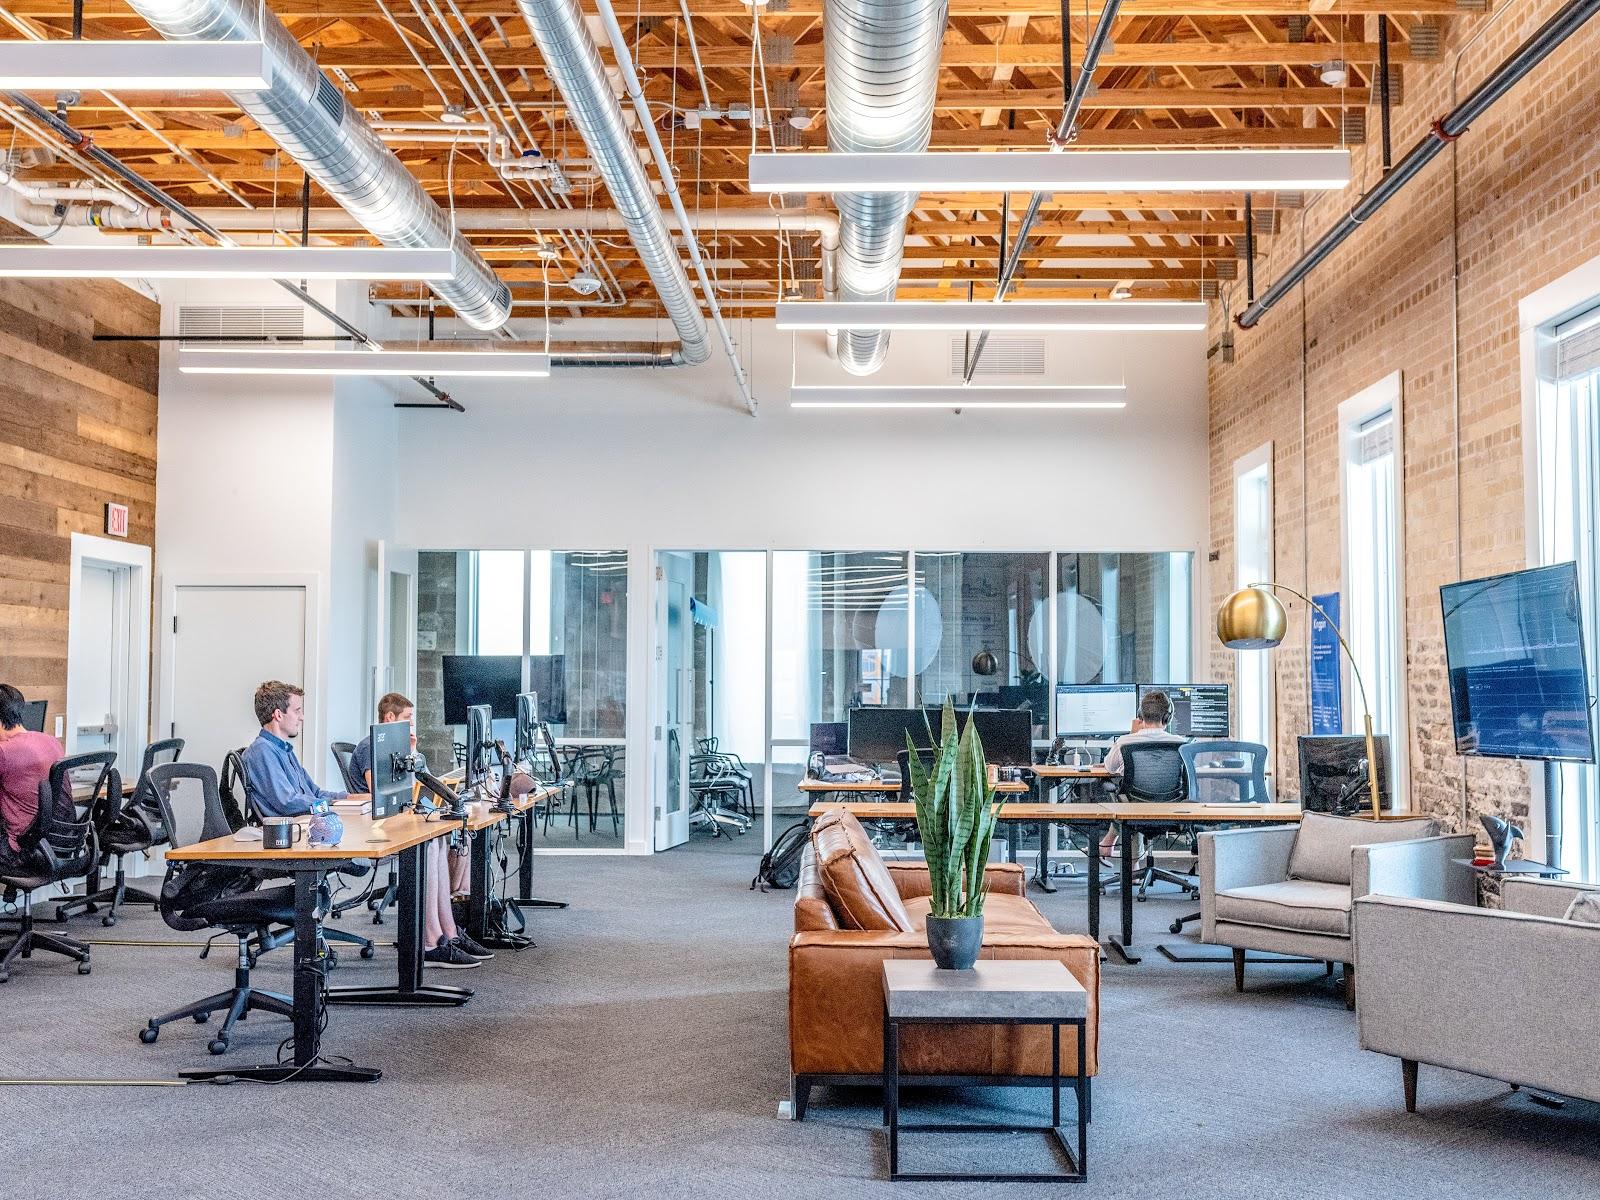 Online entrepreneurs work all around the world as digital nomads.